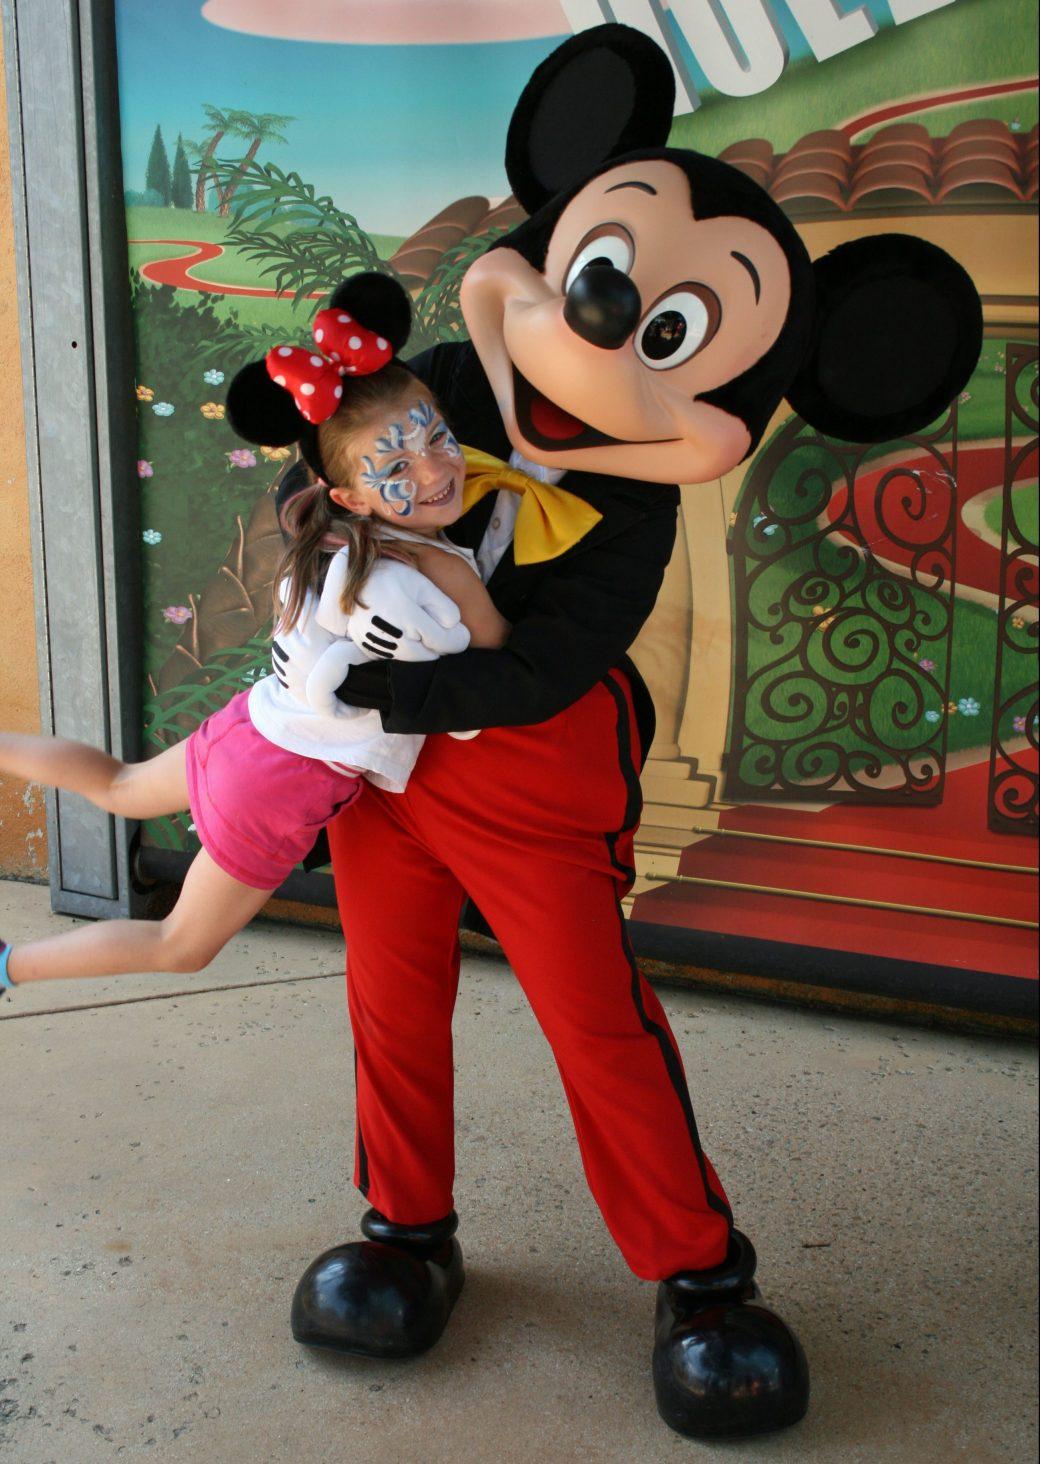 Fun with Mickey Mouse! Disneyland Paris